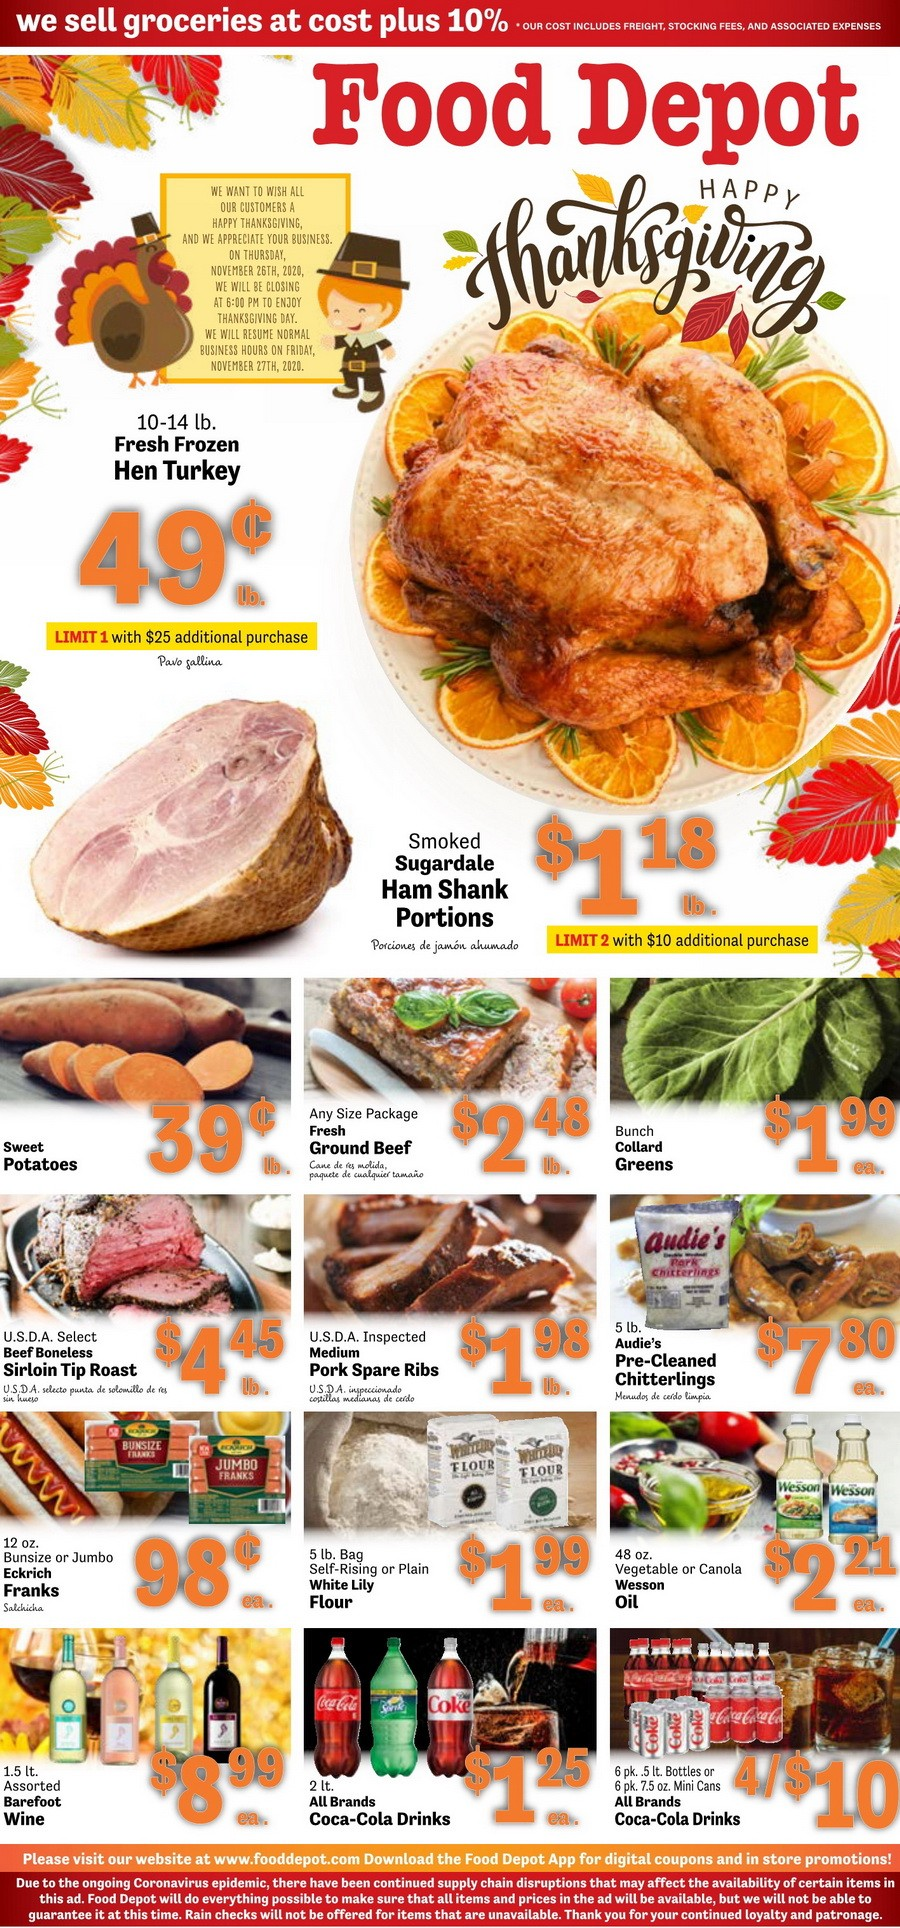 Food Depot Weekly Ad Nov 16 - Nov 29, 2020